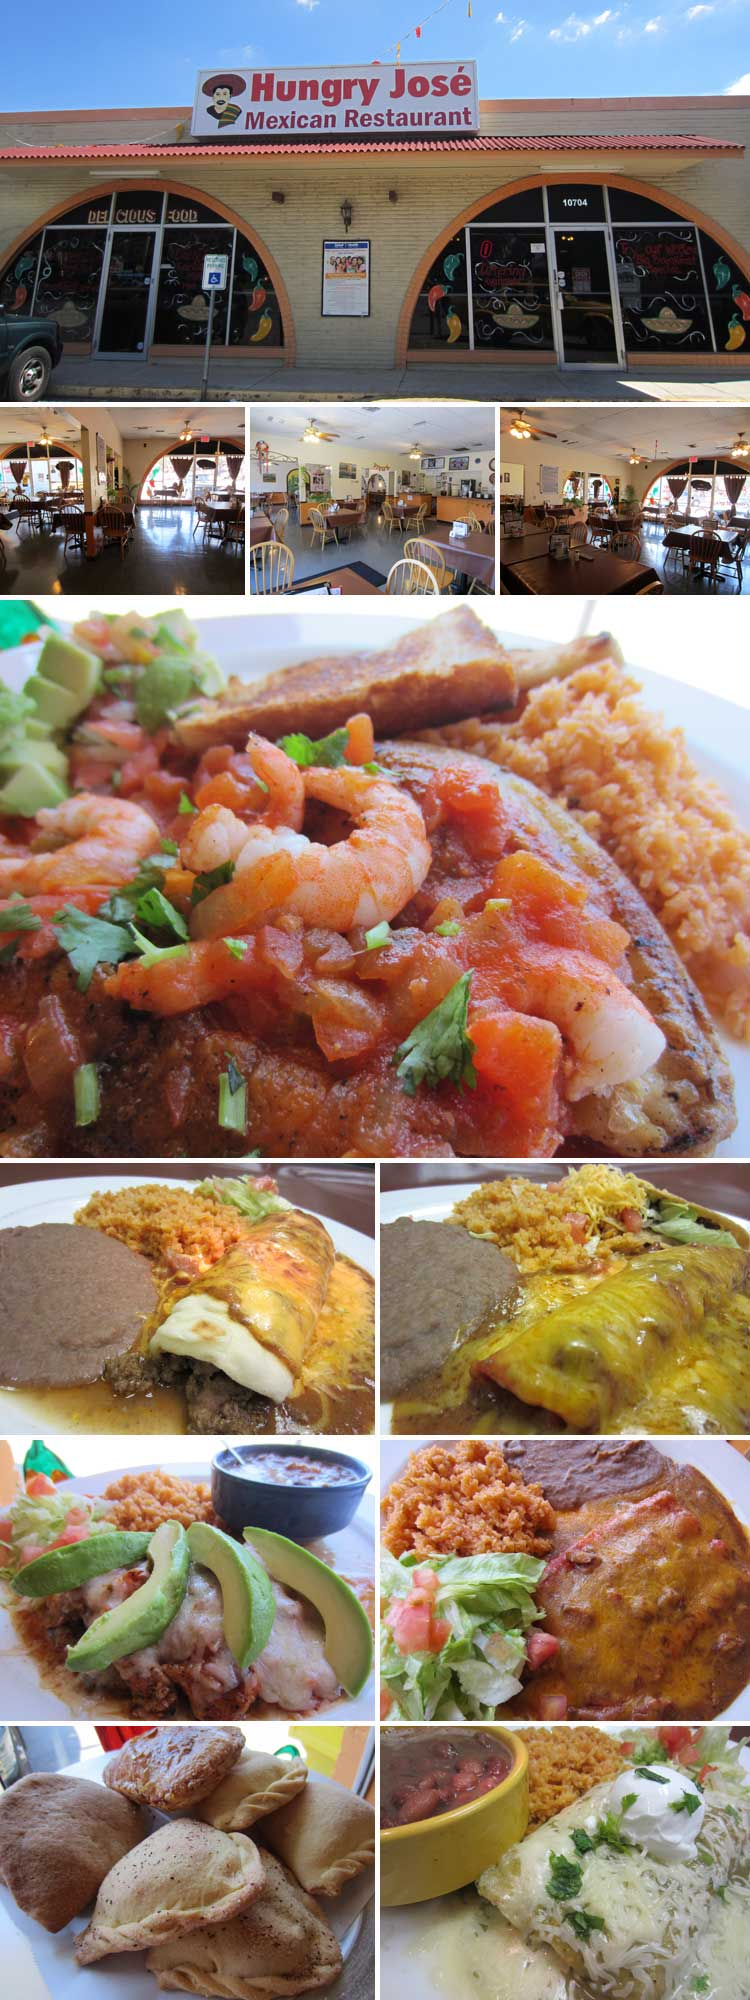 Mexican Food Catering In San Antonio Tx